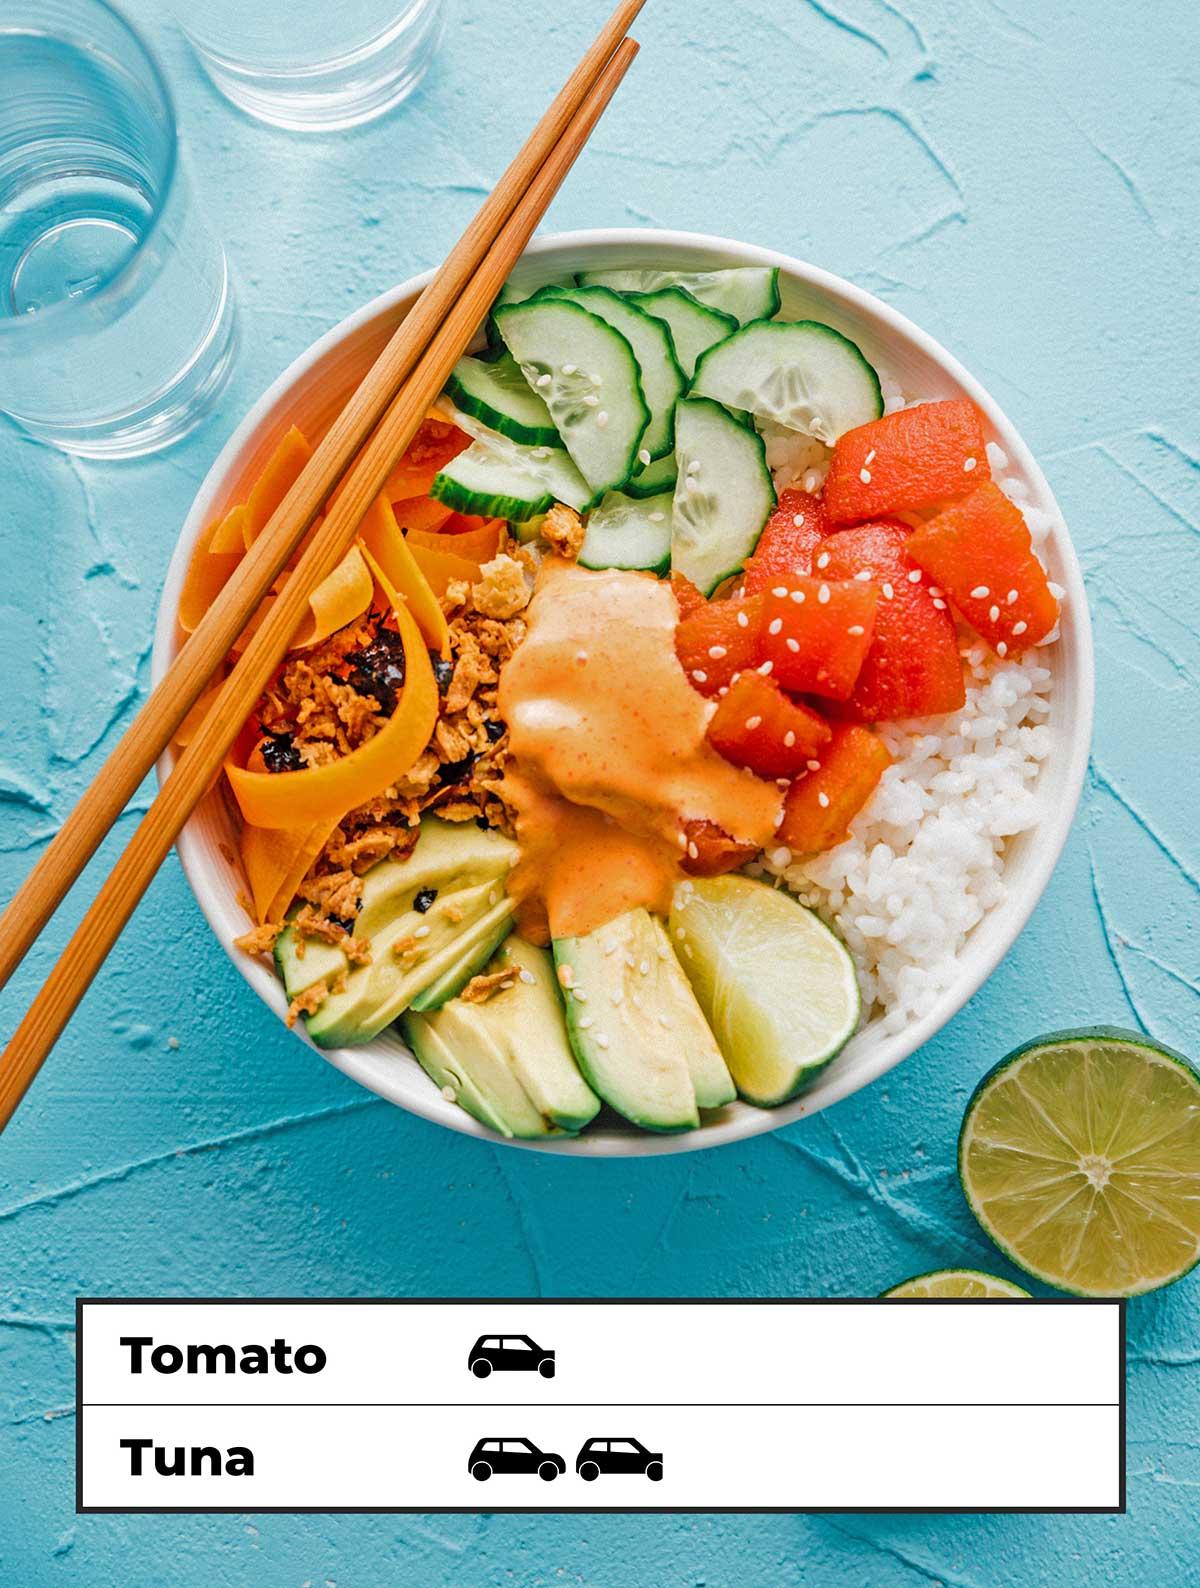 Tomato tuna sushi bowl for reducing carbon footprint